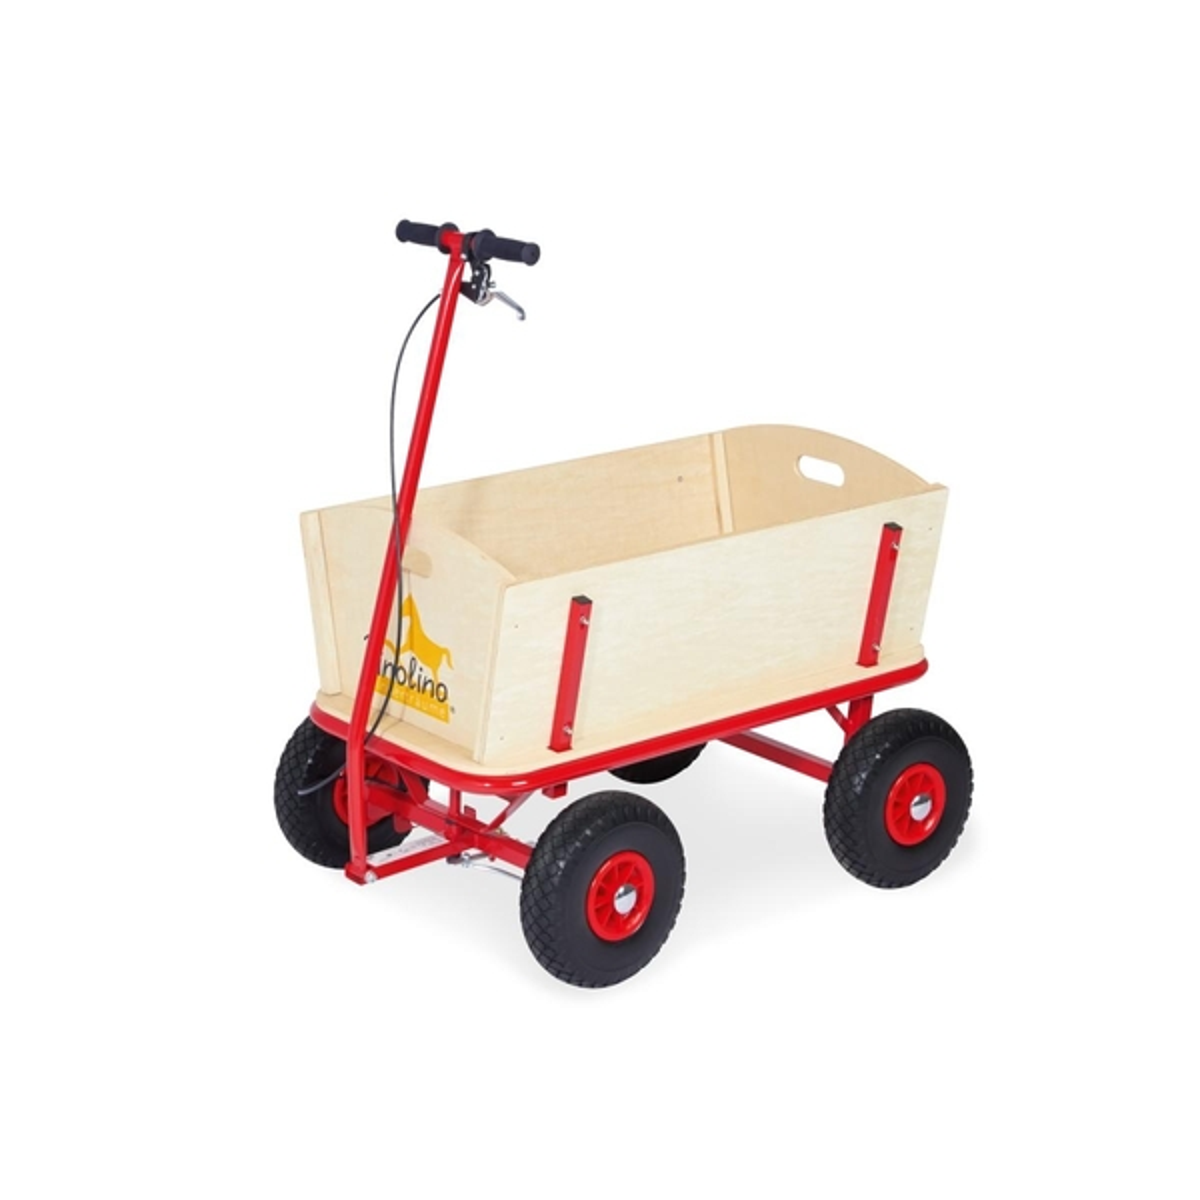 Pinolino - Chariot Til avec frein